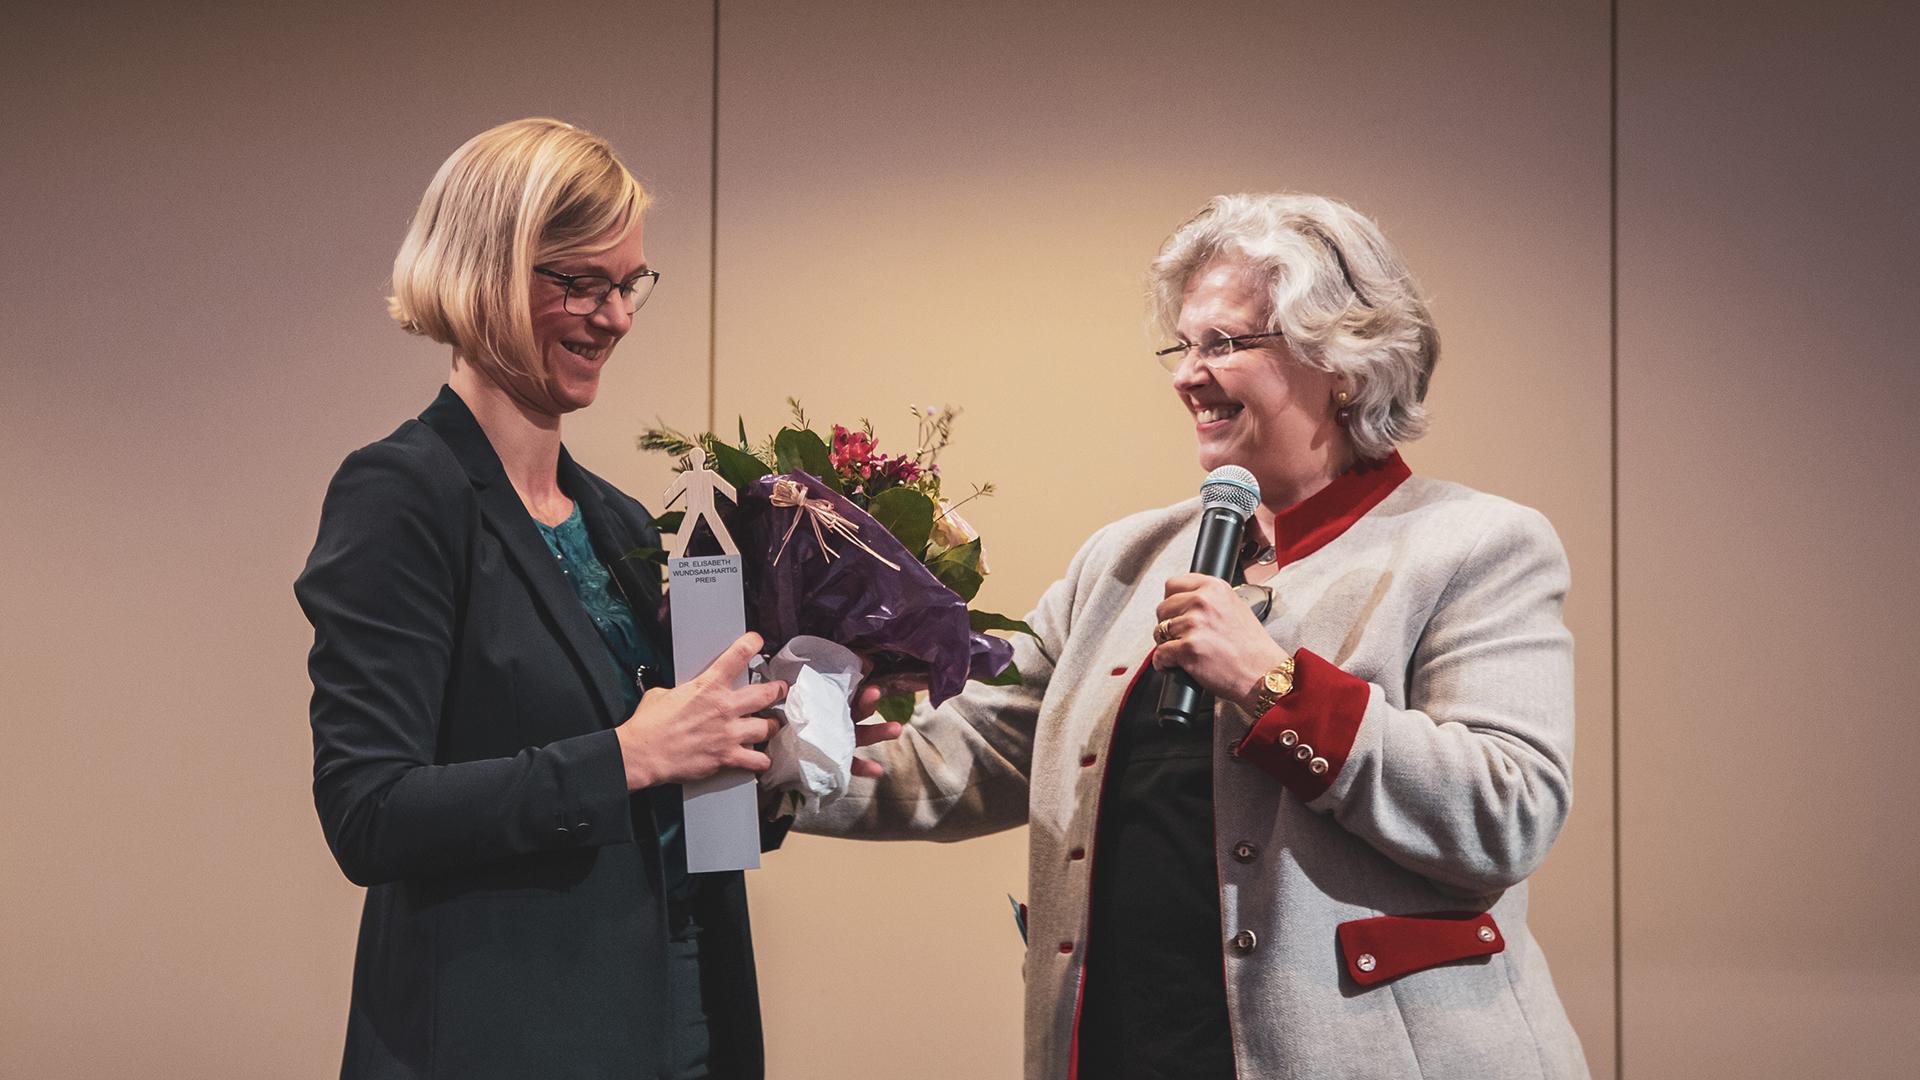 Julia Moser und Aglaë Hagg